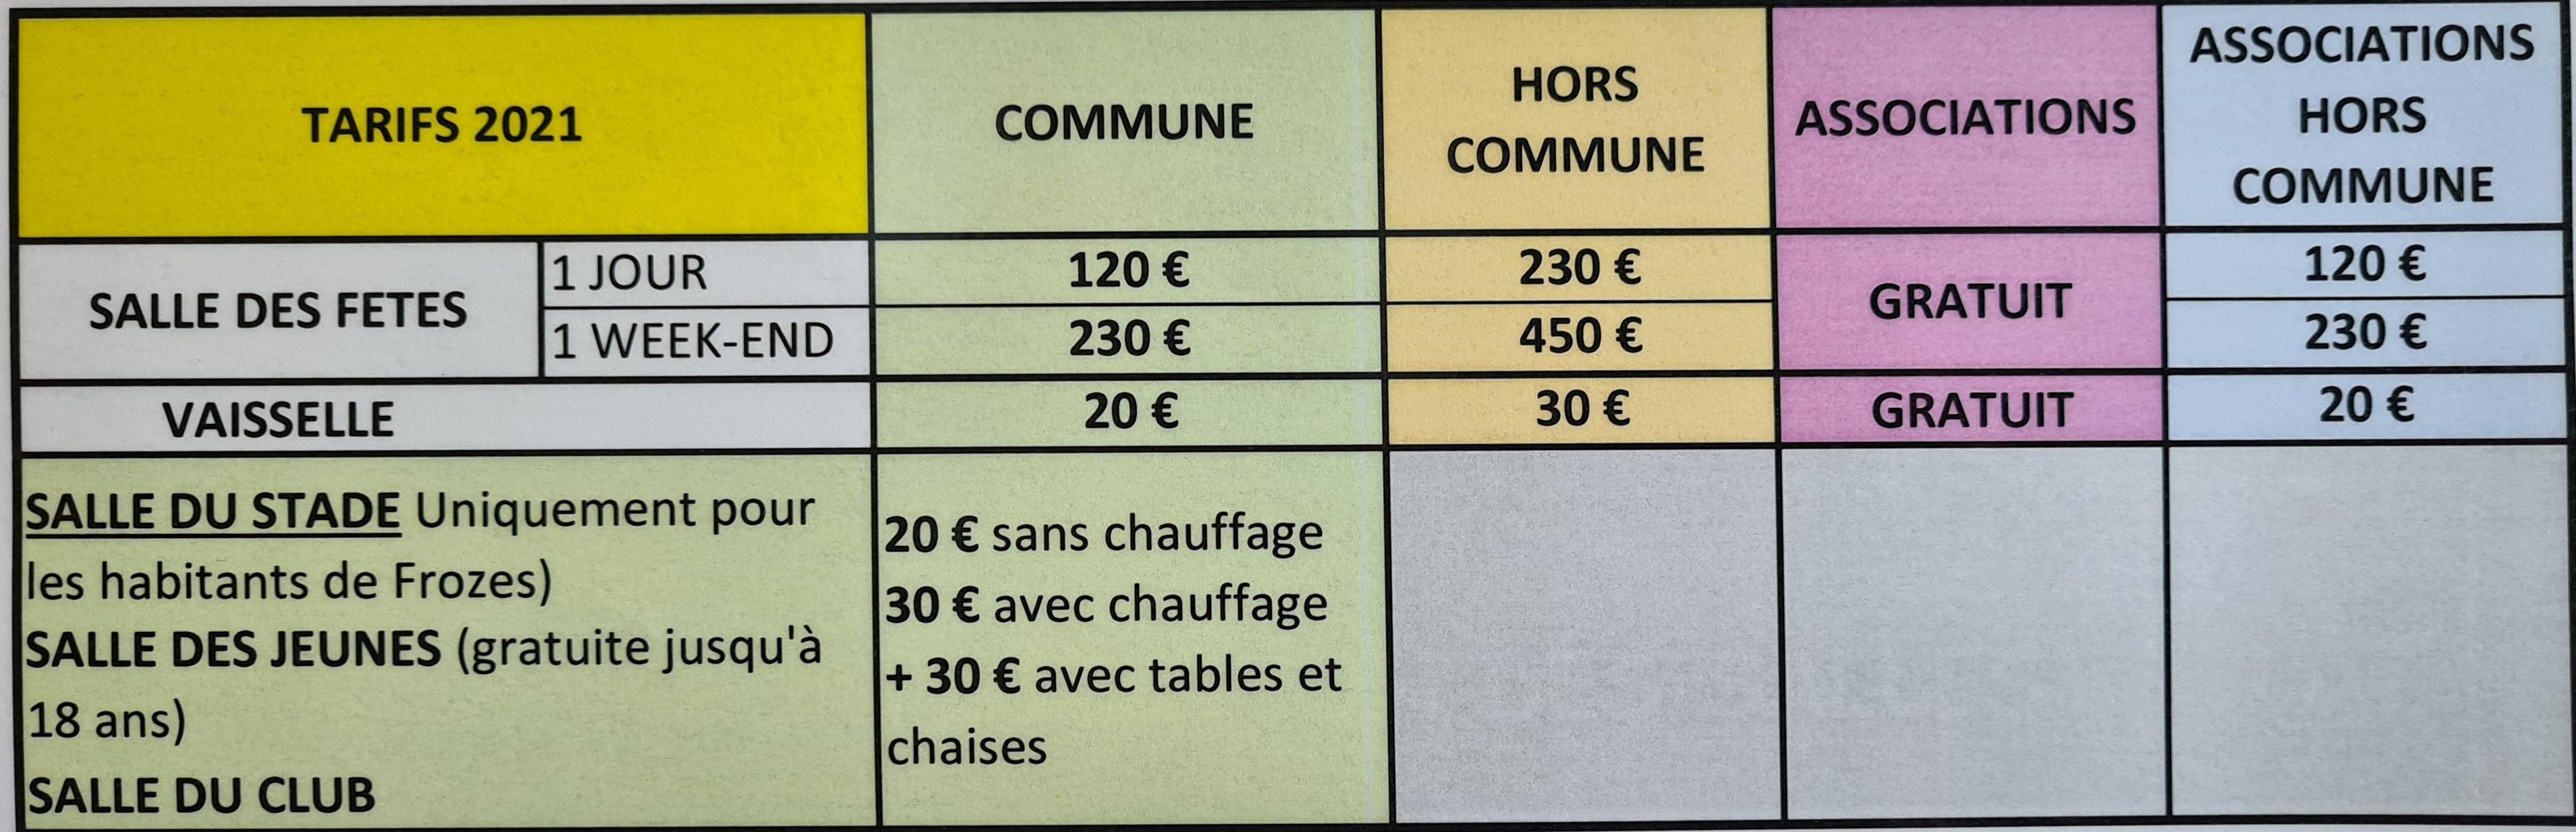 tarifs sdf 2021